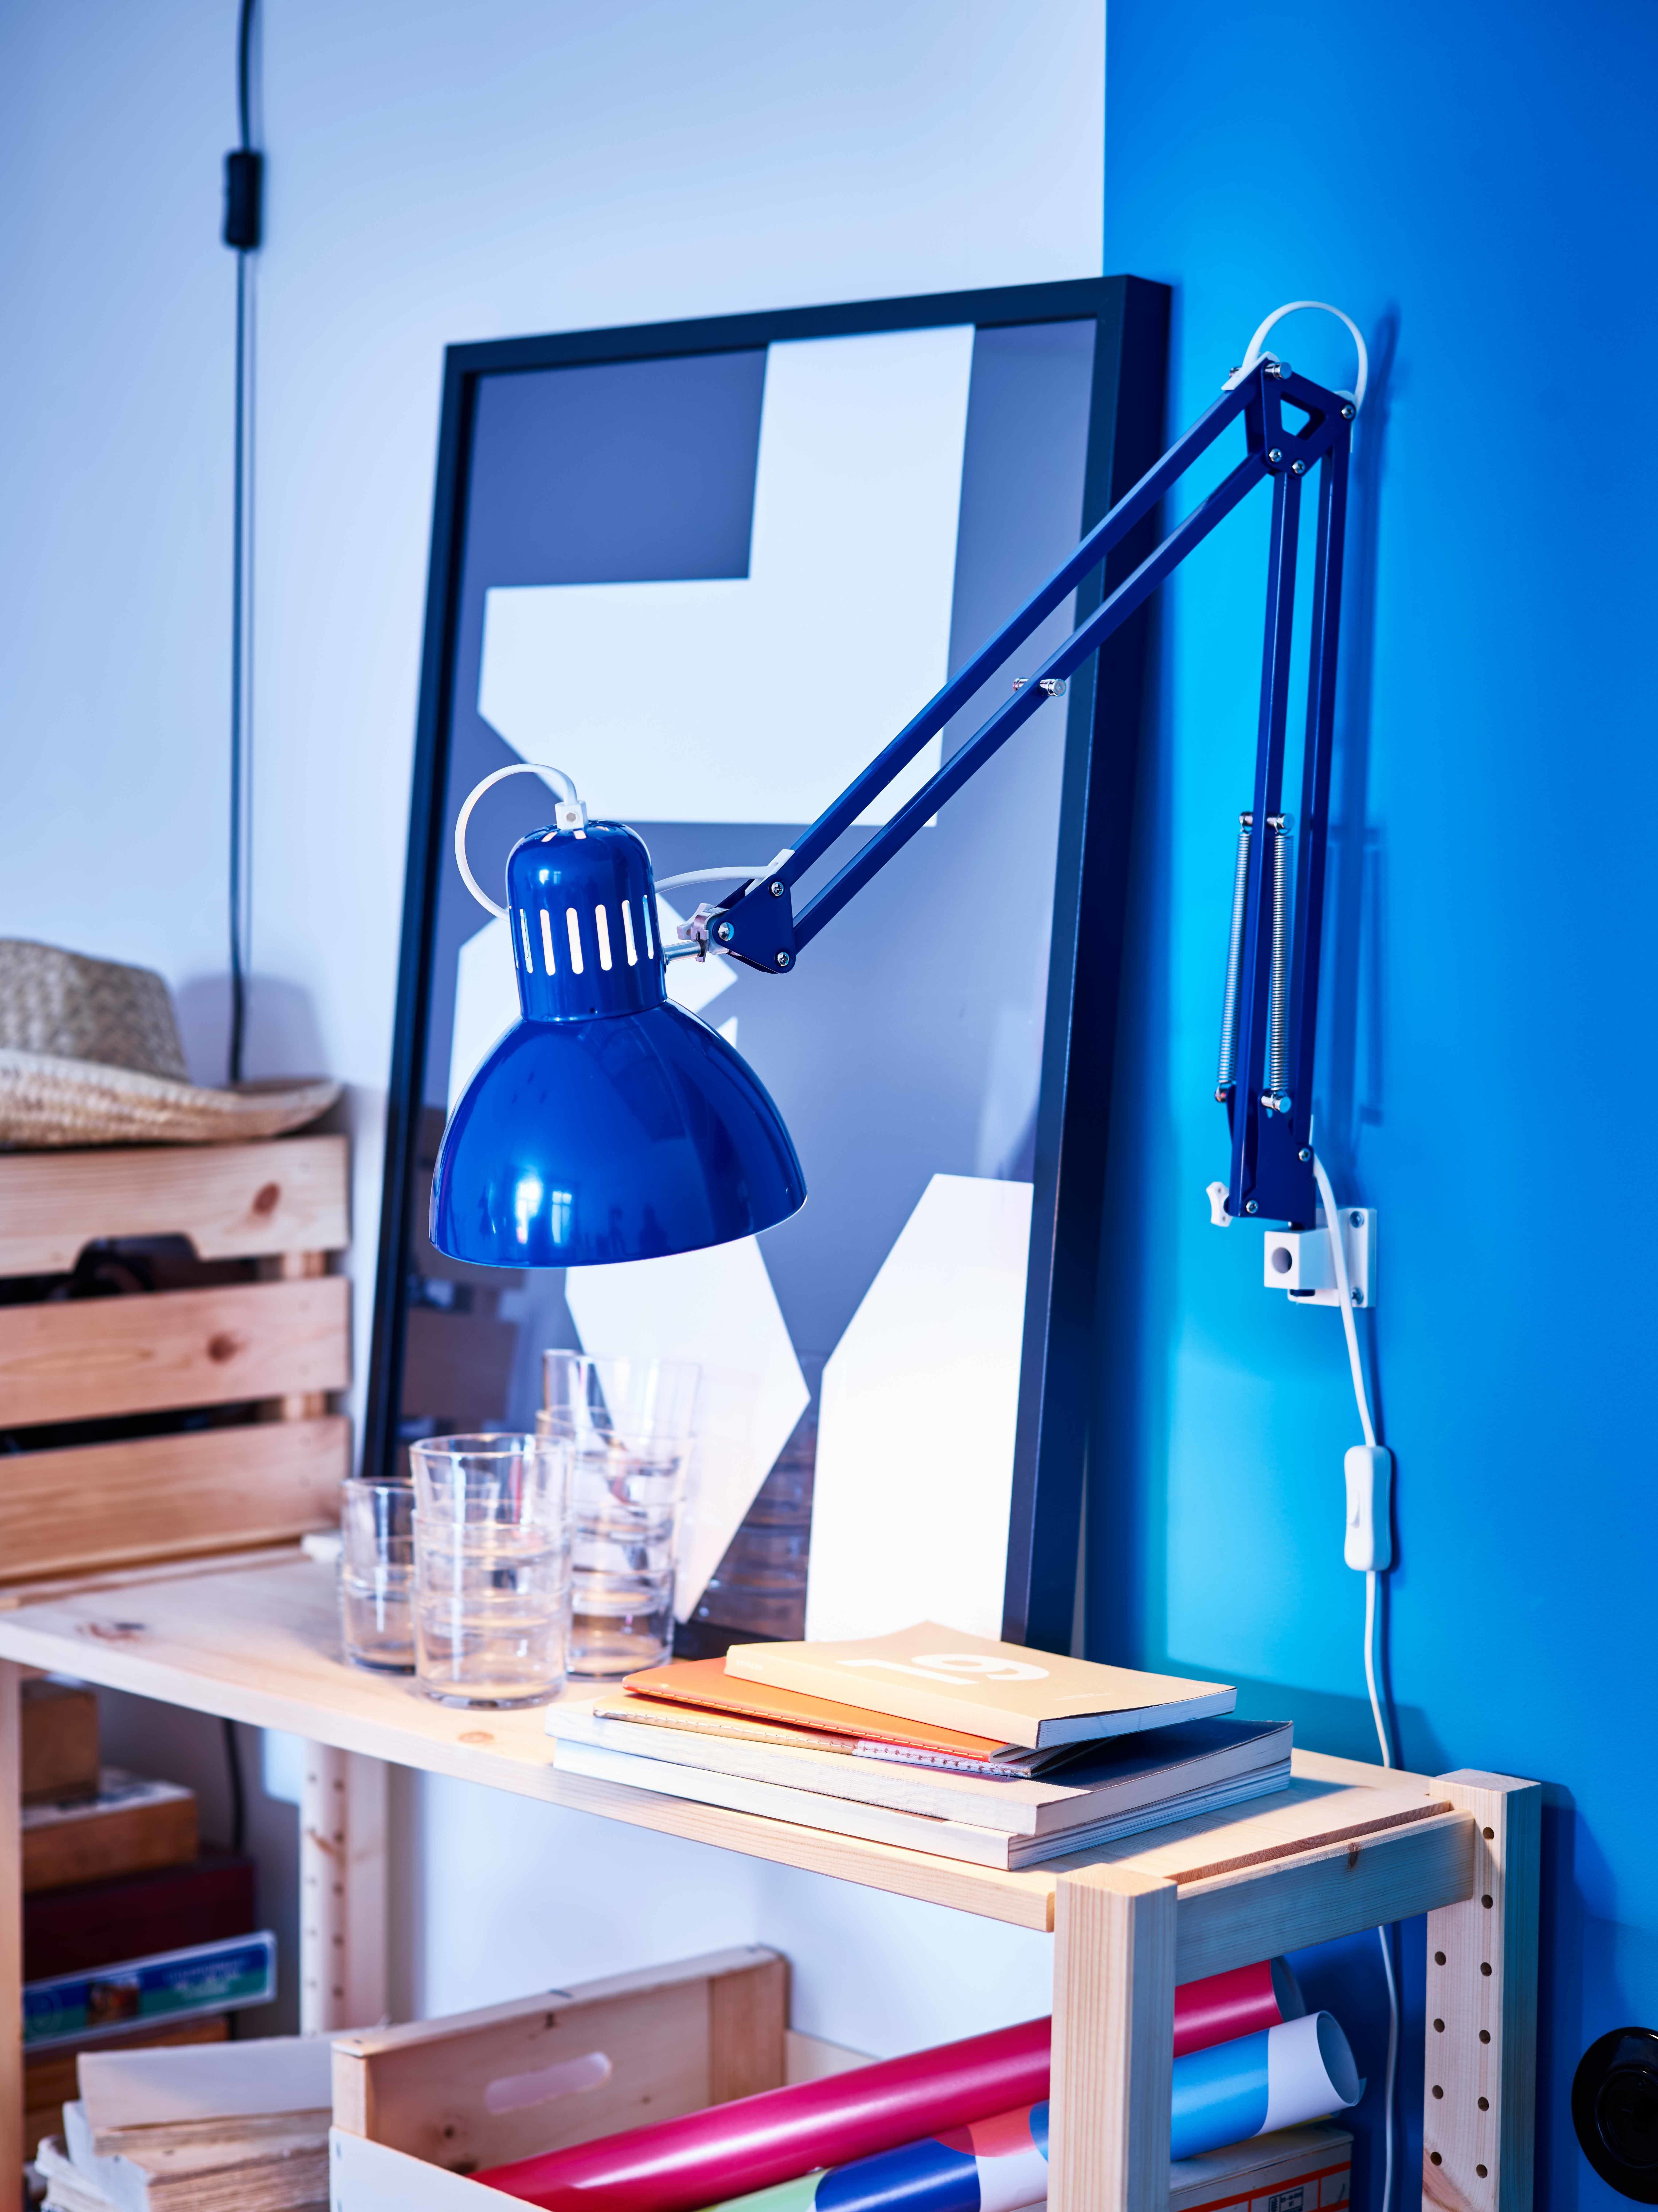 Tertial | Lampara de escritorio, Luz de lámpara, Bombillas